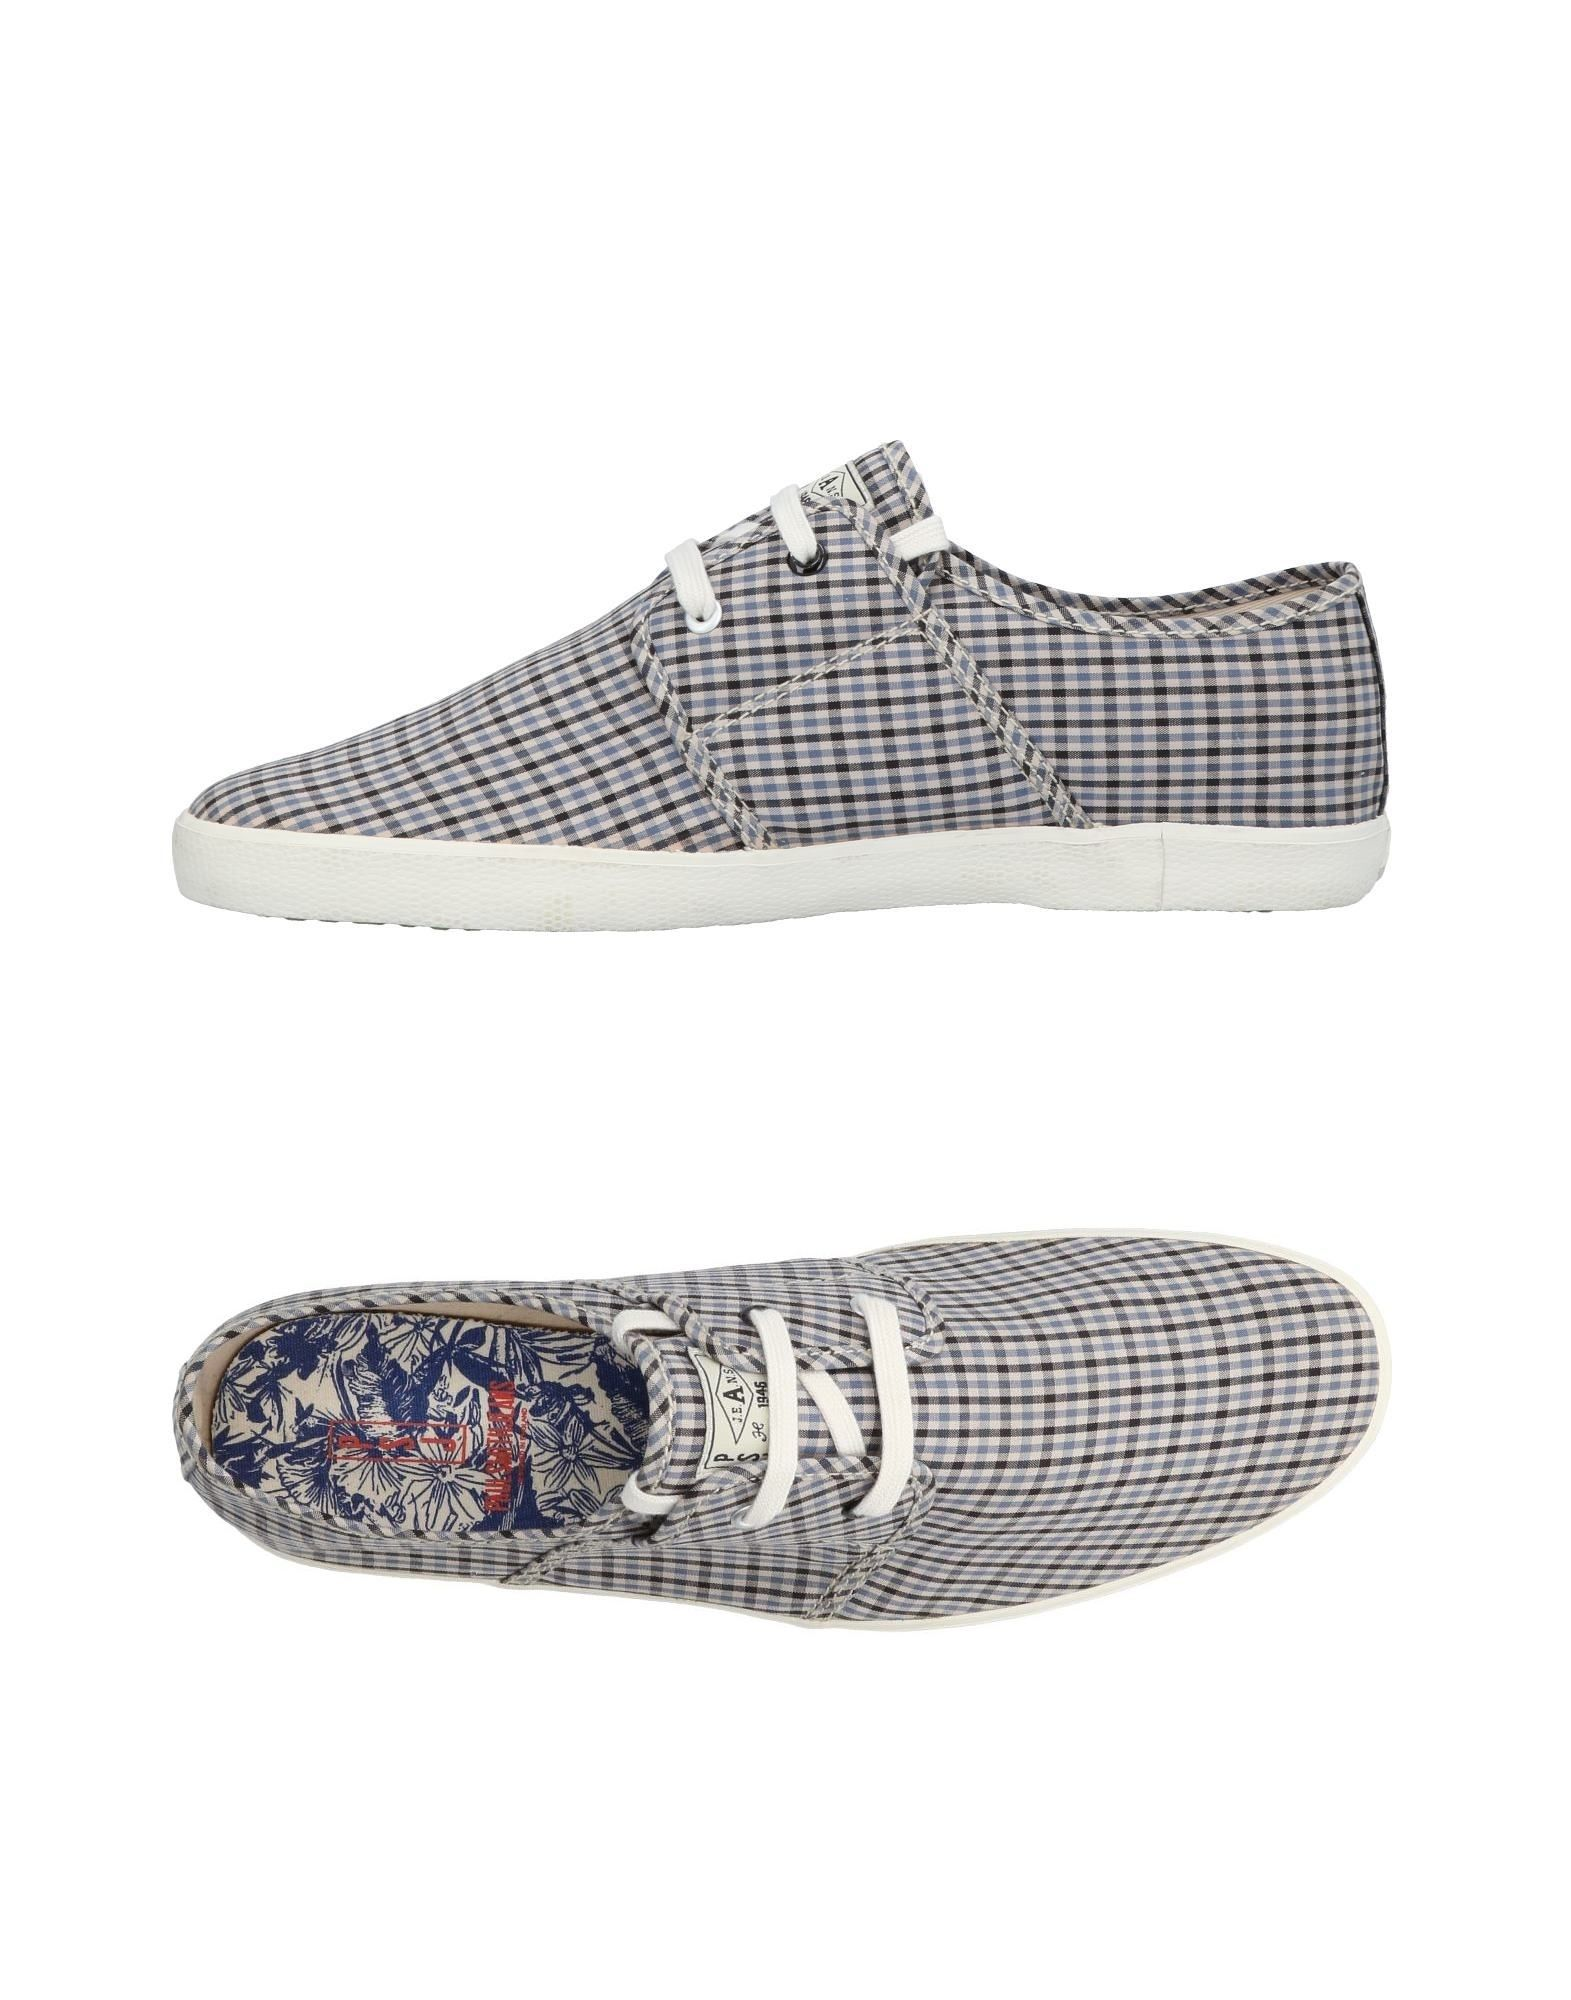 Sneakers Paul Smith Uomo - Acquista online su